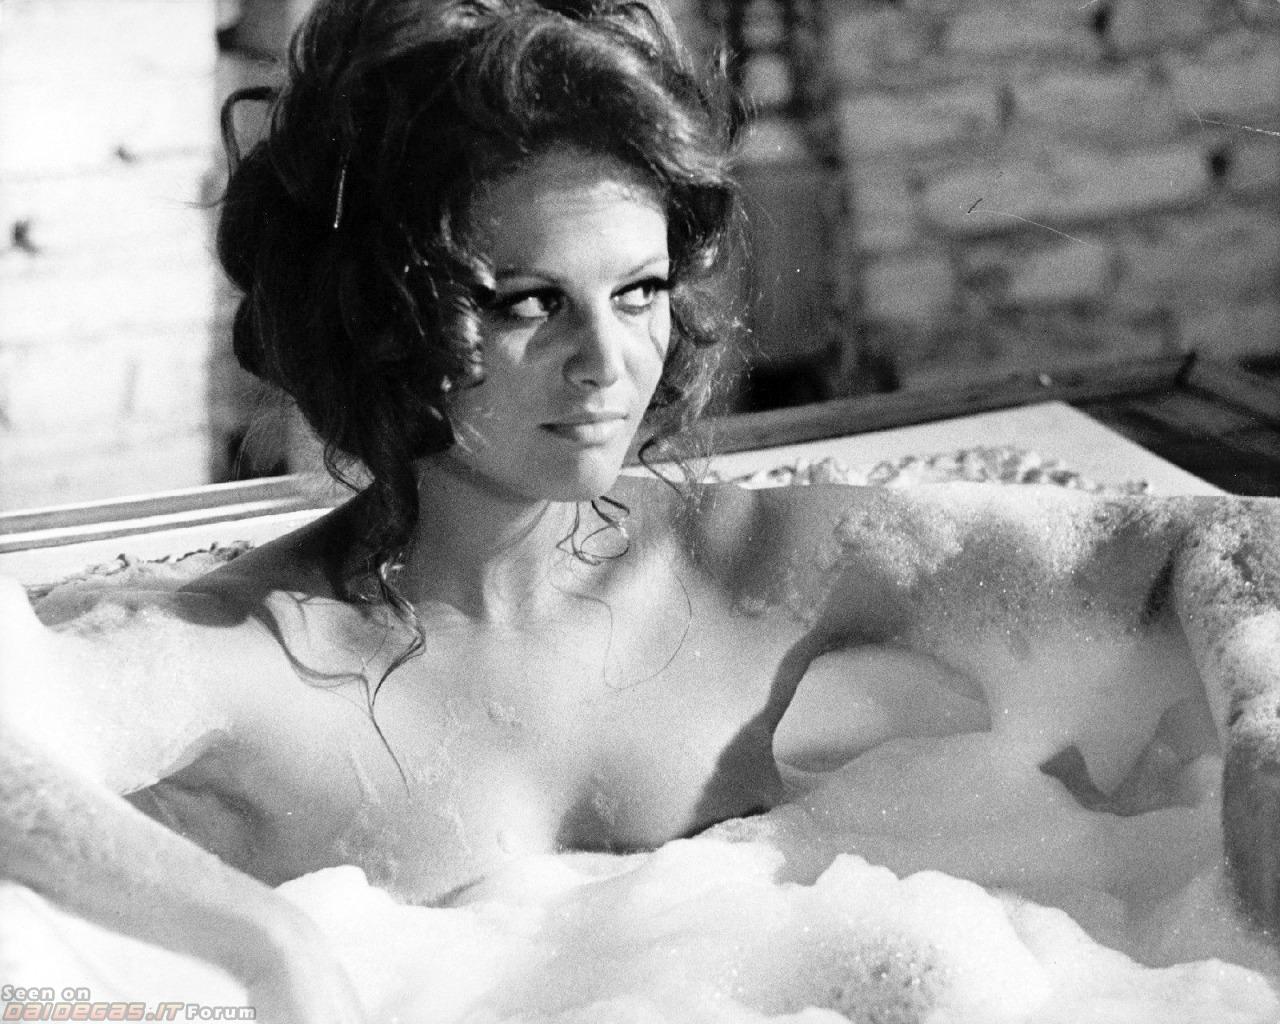 Claudia-Cardinale-nuda-bagno (1)